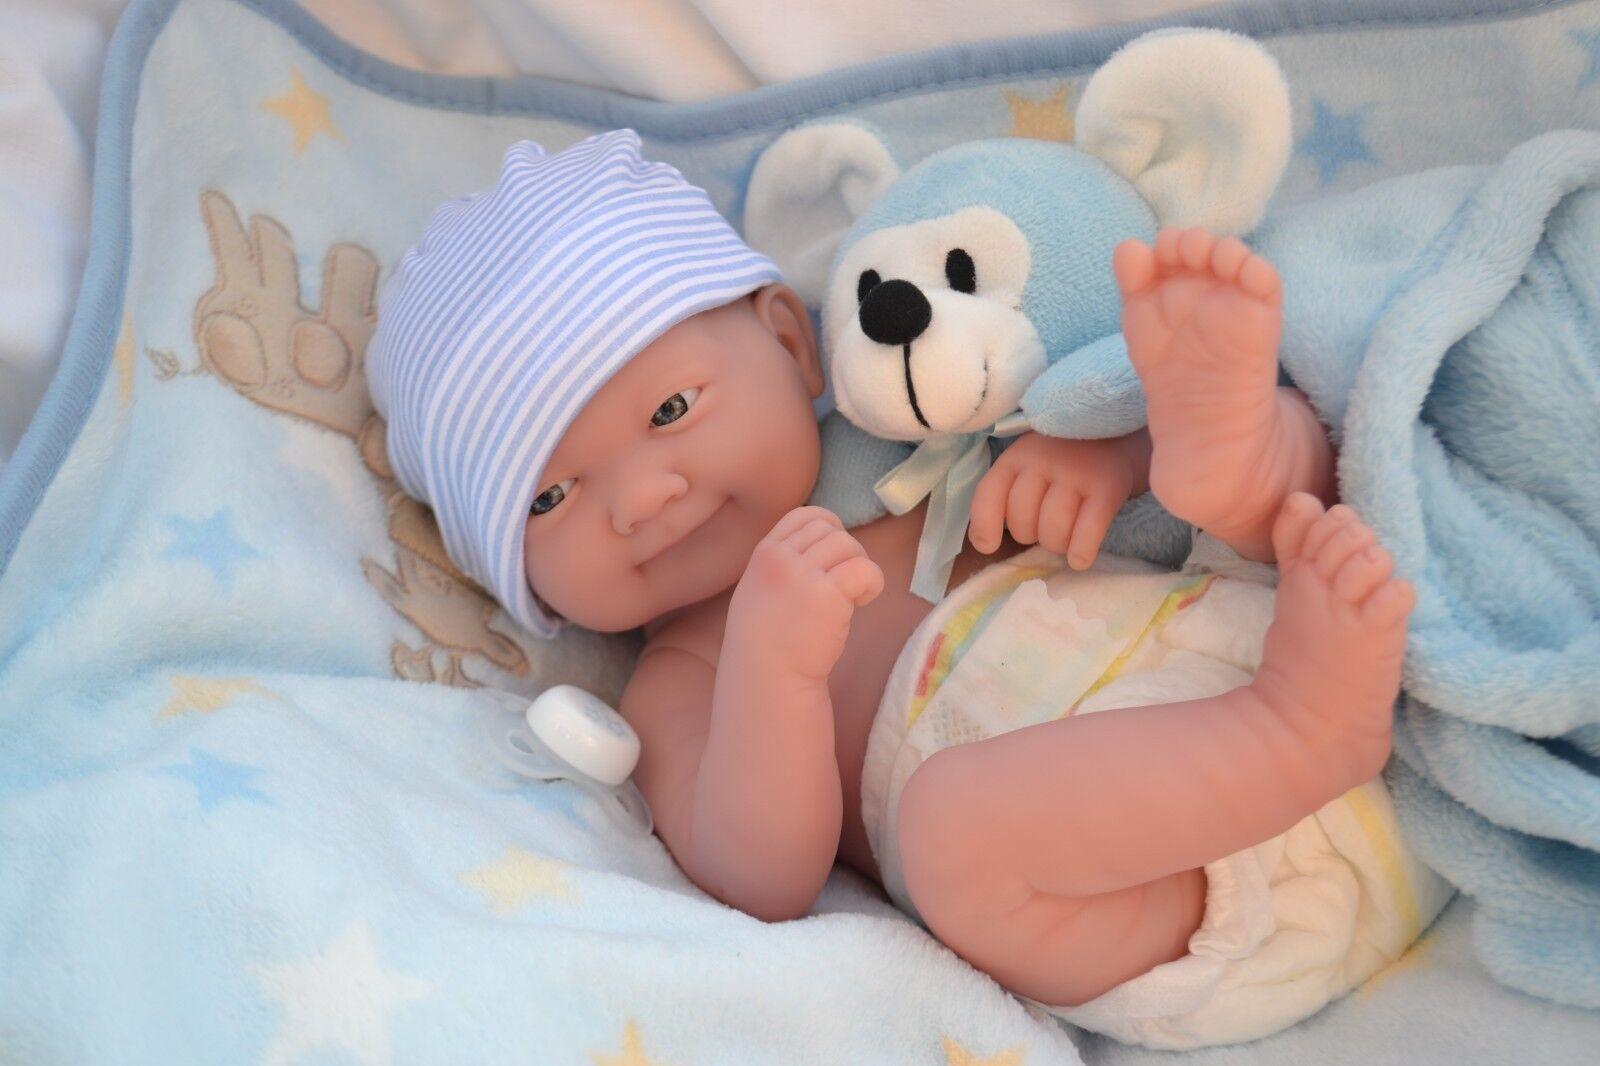 ️ Cutie Pie  ️ BERENGUER LA NEWBORN BABY BOY DOLL + EXTRAS FOR REBORN PLAY NEW